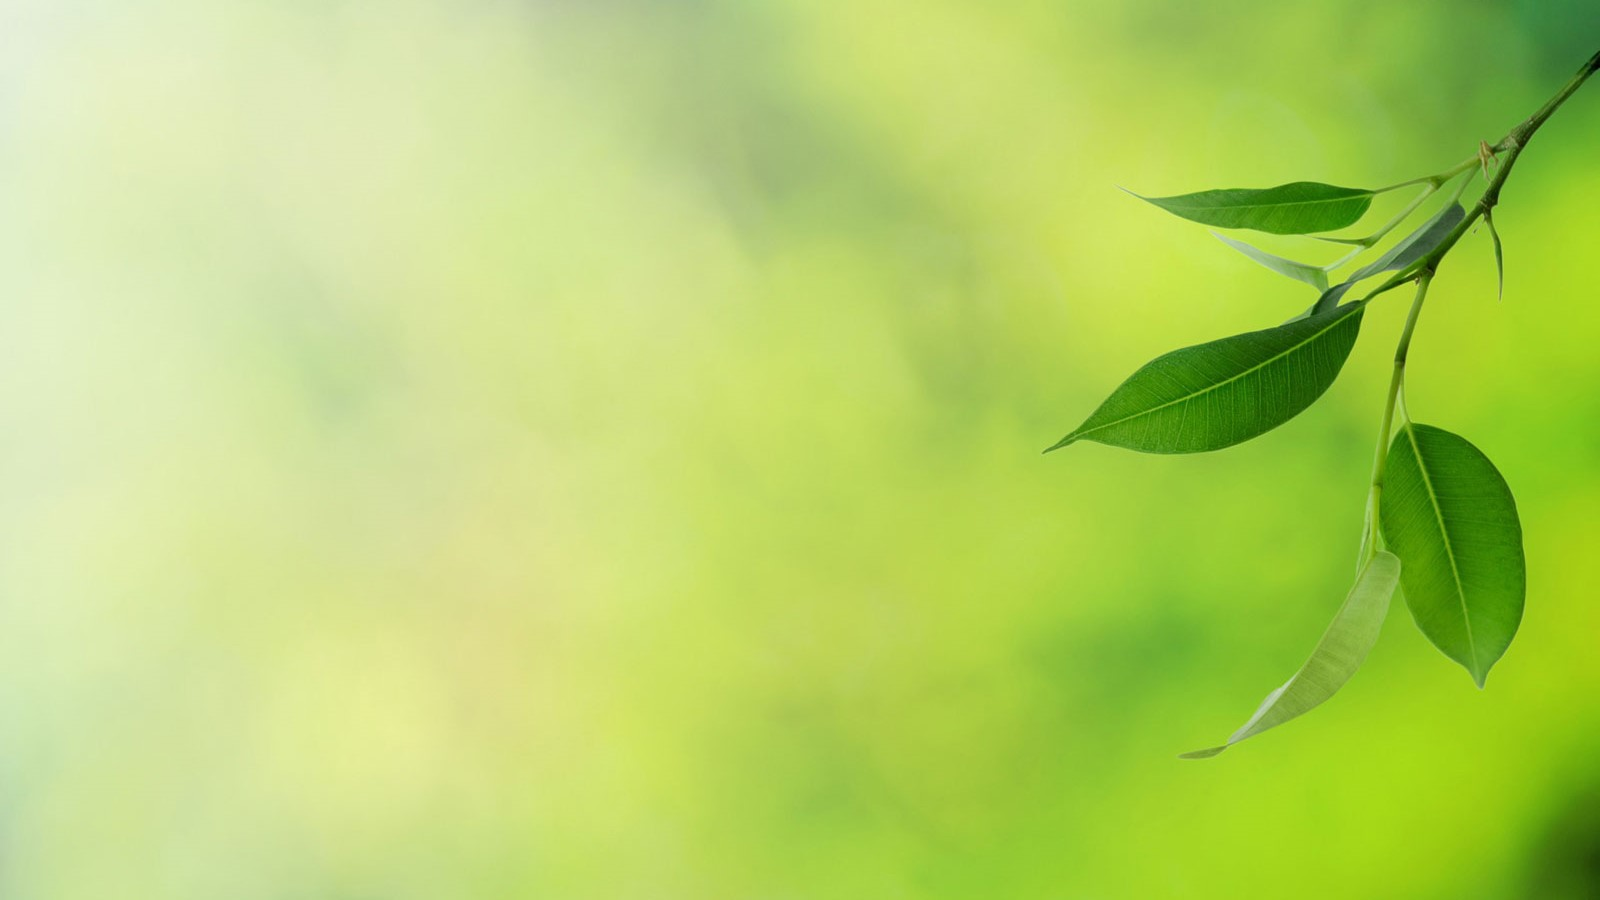 Green leaf bg